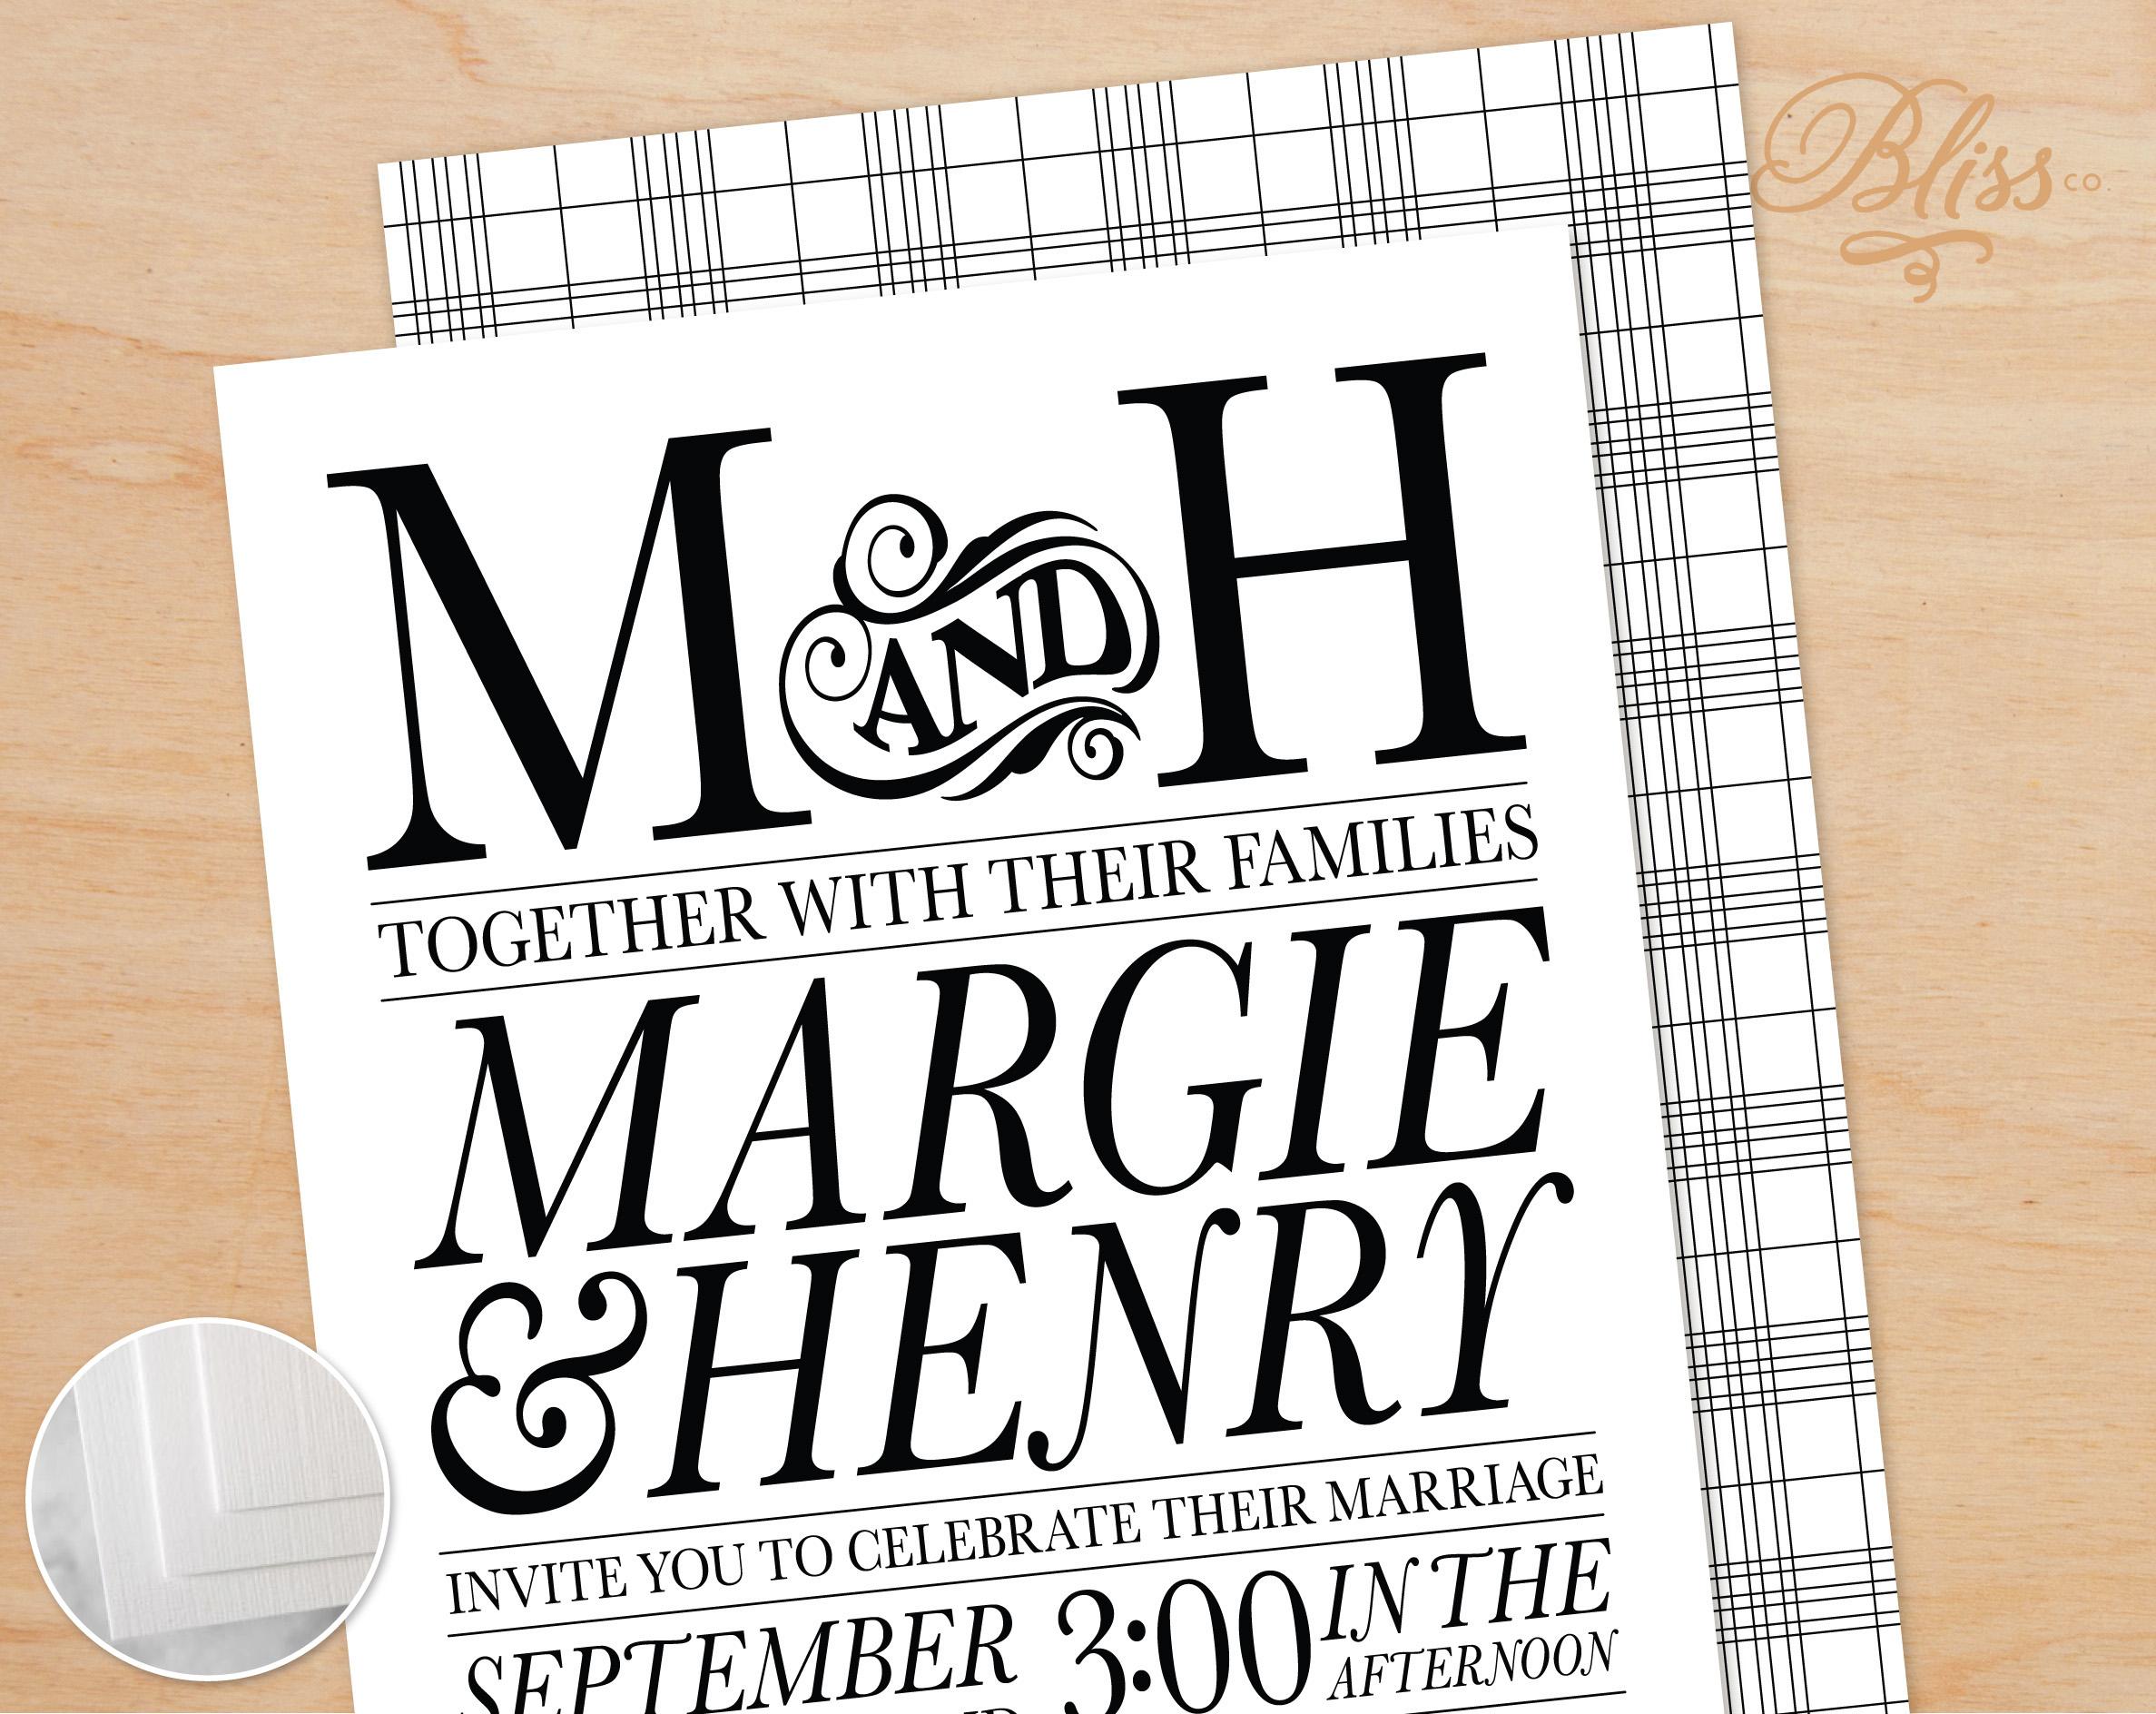 Margie&Henry.jpg